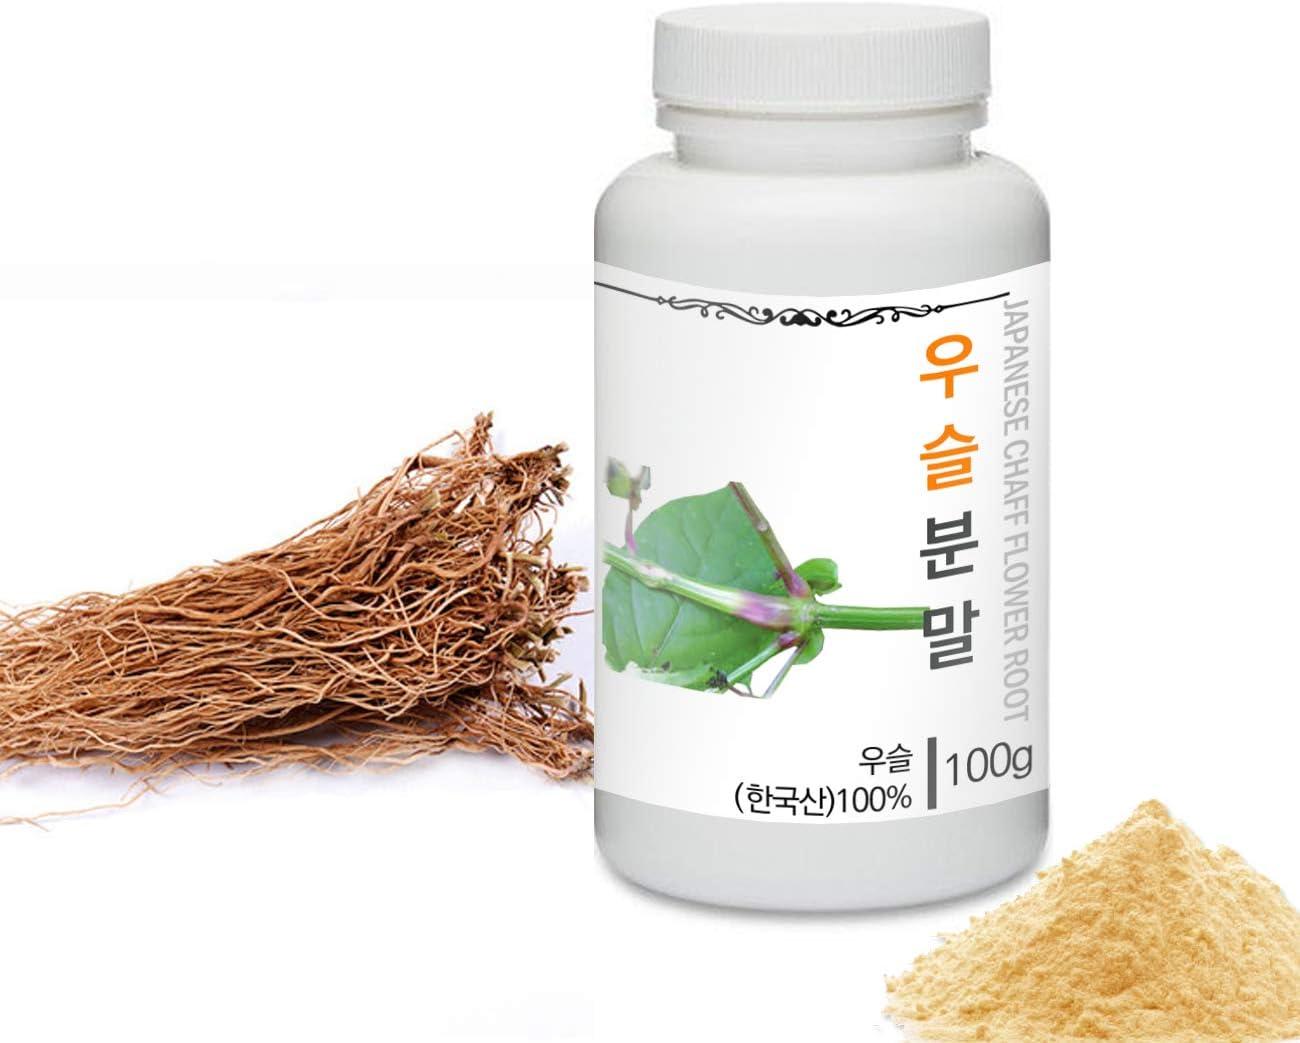 [Medicinal Herbal Powder] Prince Natural Japanese Chaff Flower Roots Powder/프린스 우슬분말, 3.6oz / 100g (Achyranthes Japonica/우슬)